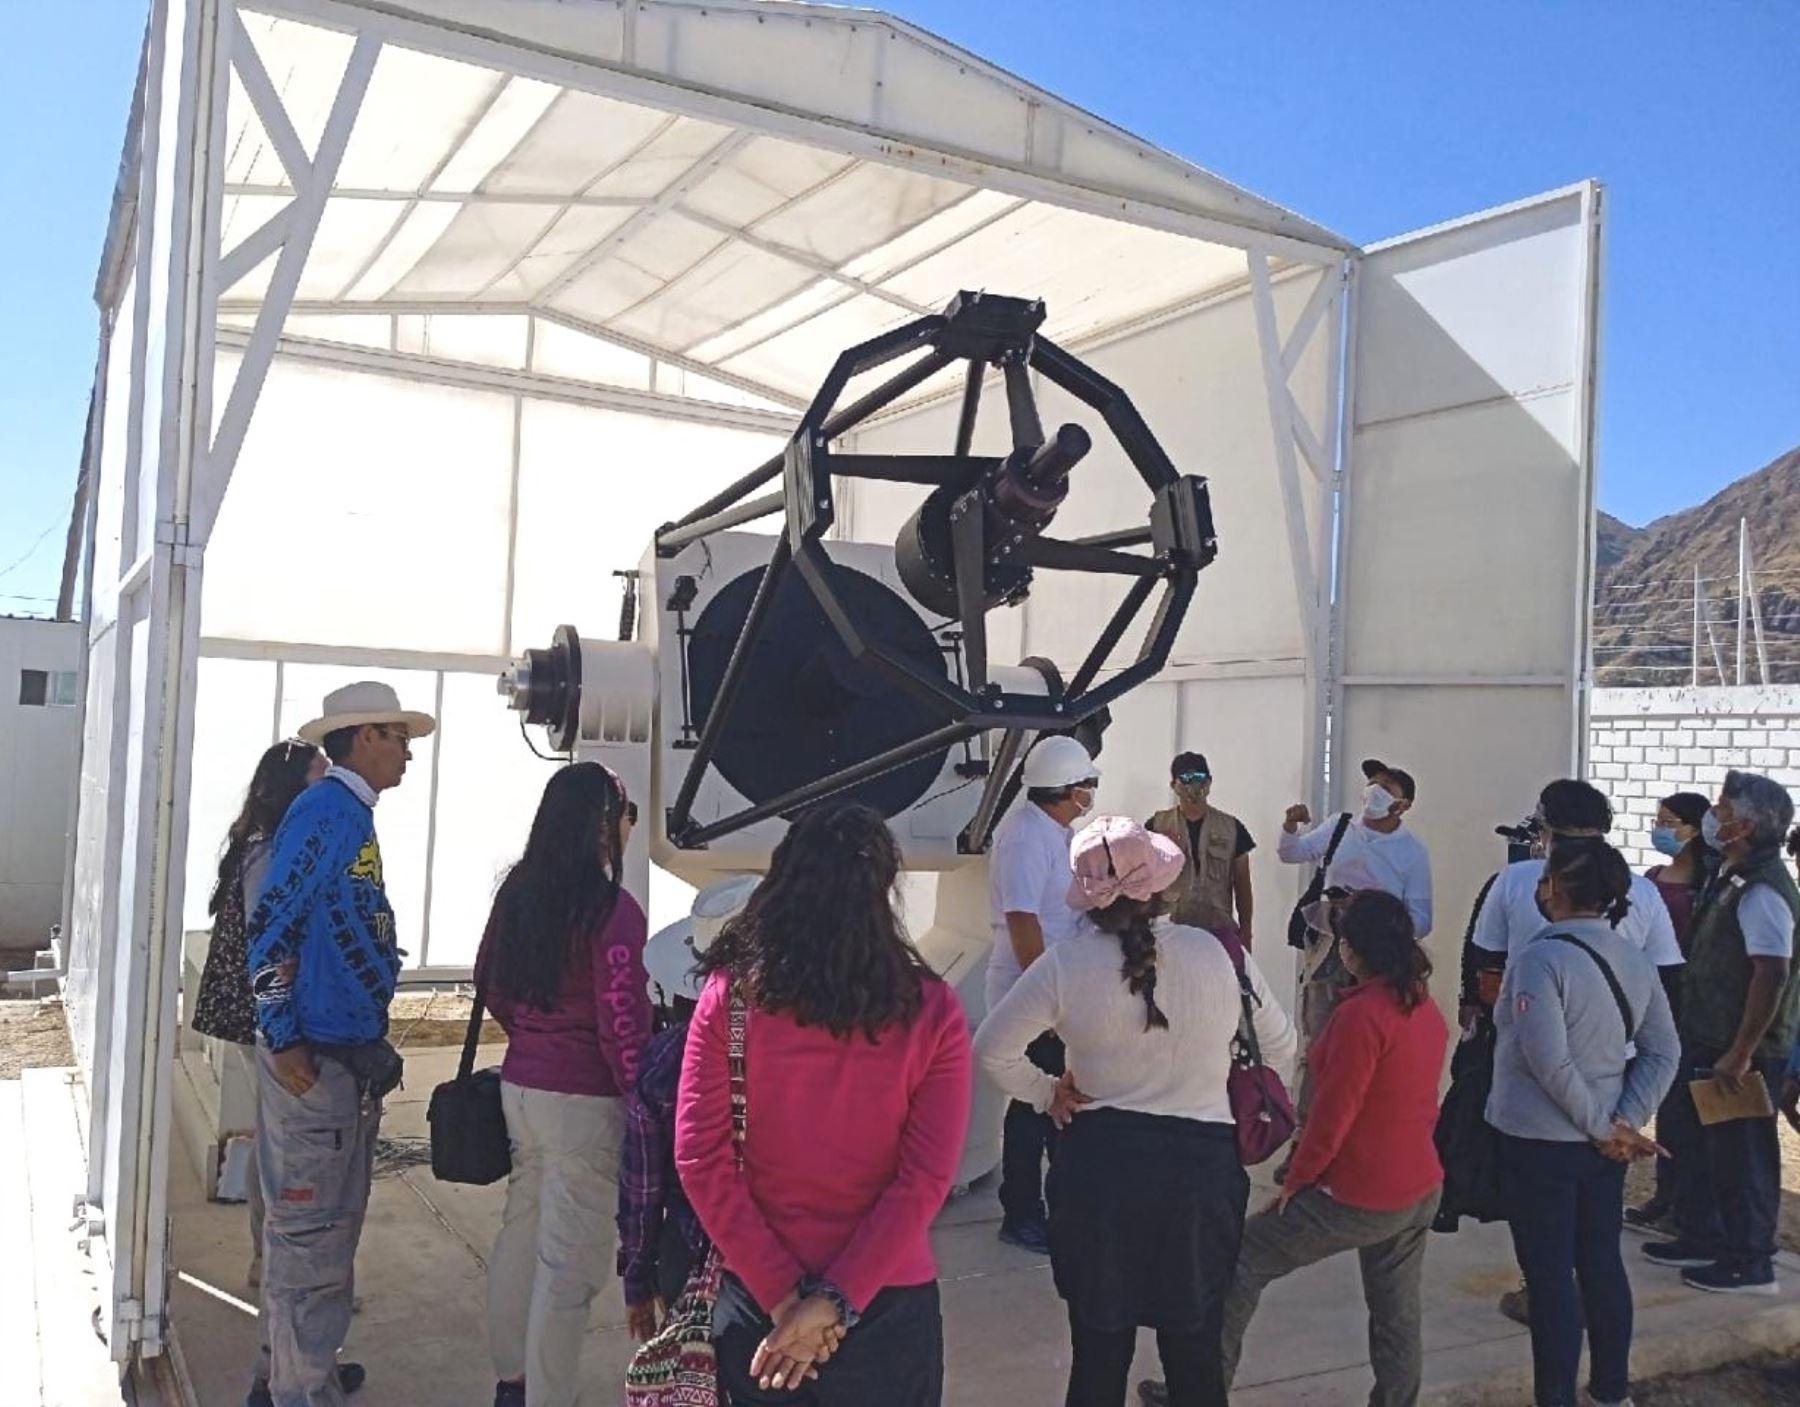 Moquegua busca posicionar a su observatorio astronómico como potencial destino turístico